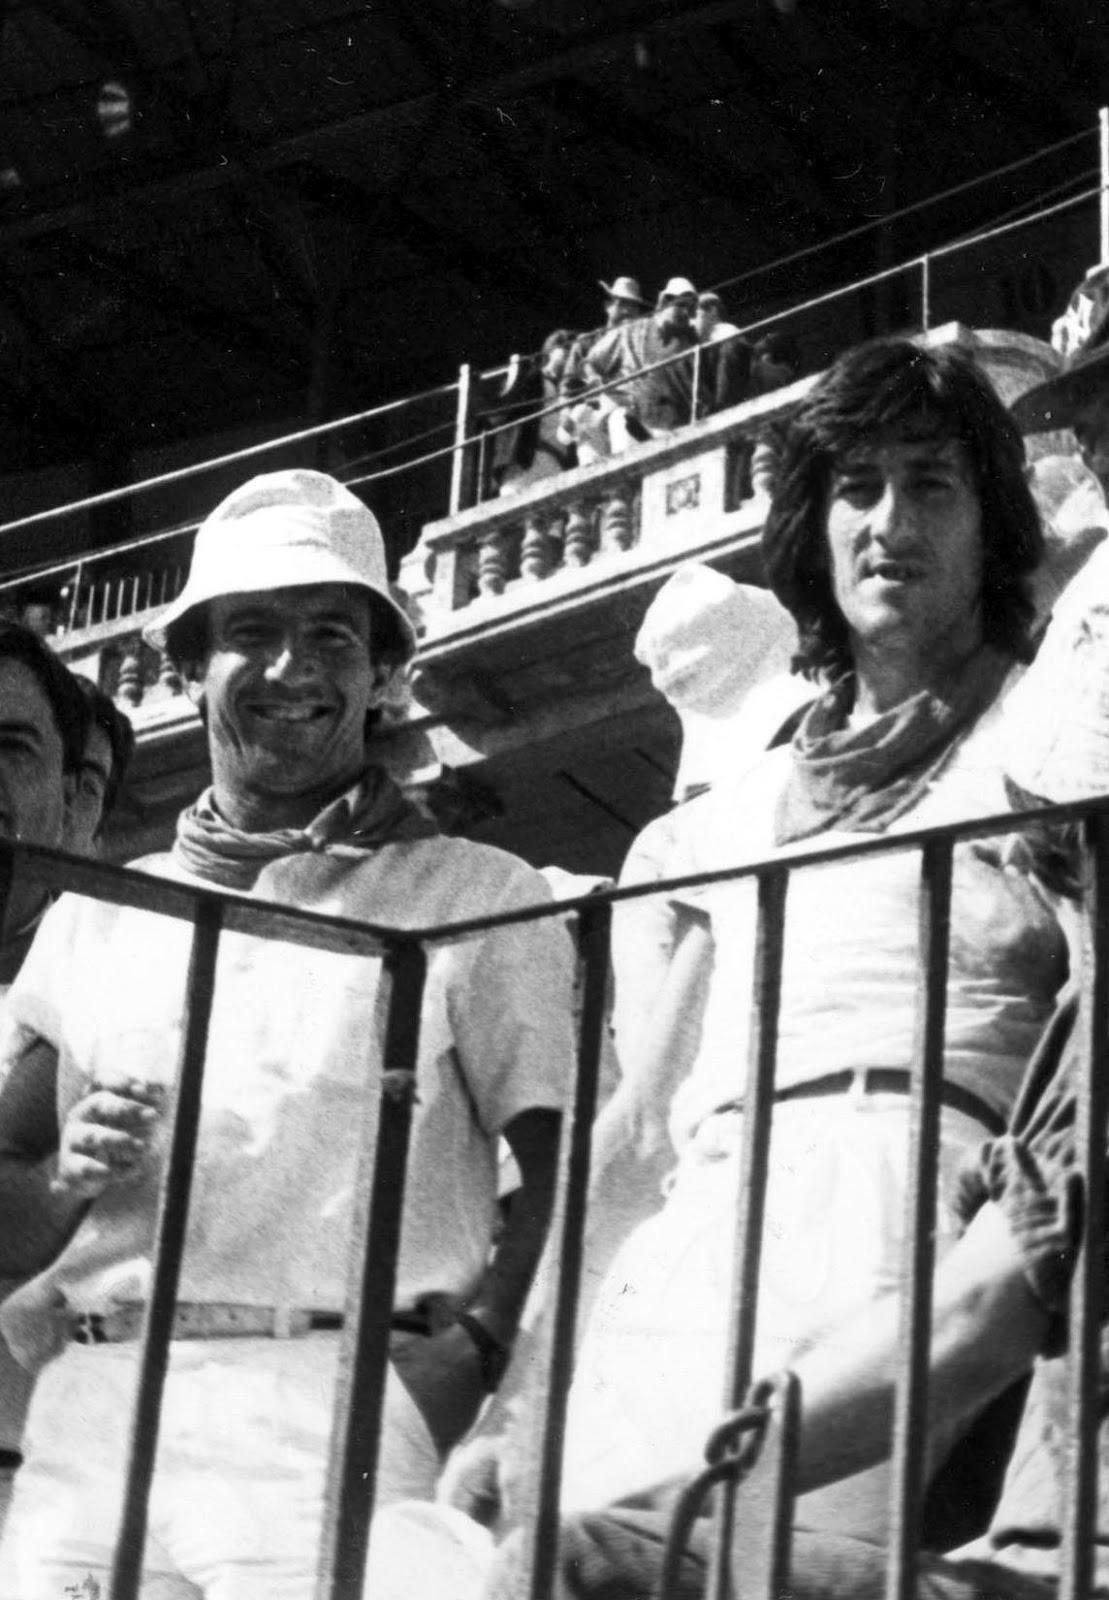 FOTOS HISTORICAS O CHULAS  DE FUTBOL Juanito+en+San+Ferm%C3%ADn+1985